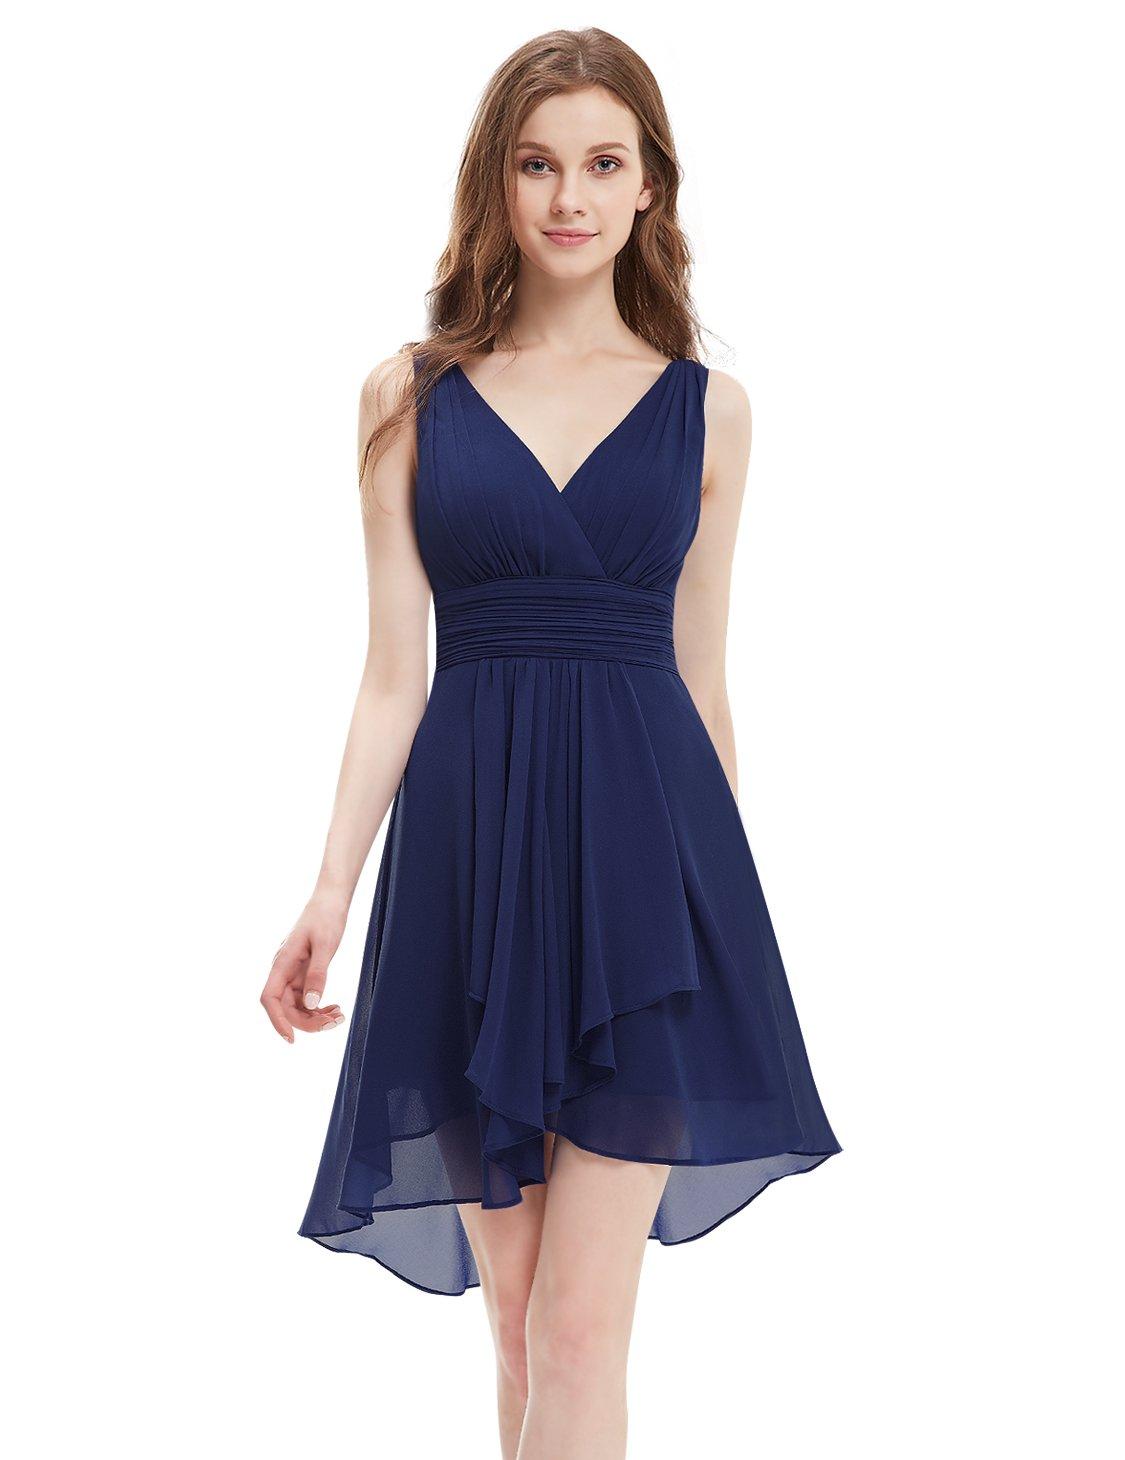 Navy Short Bridesmaid Dresses: Amazon.com